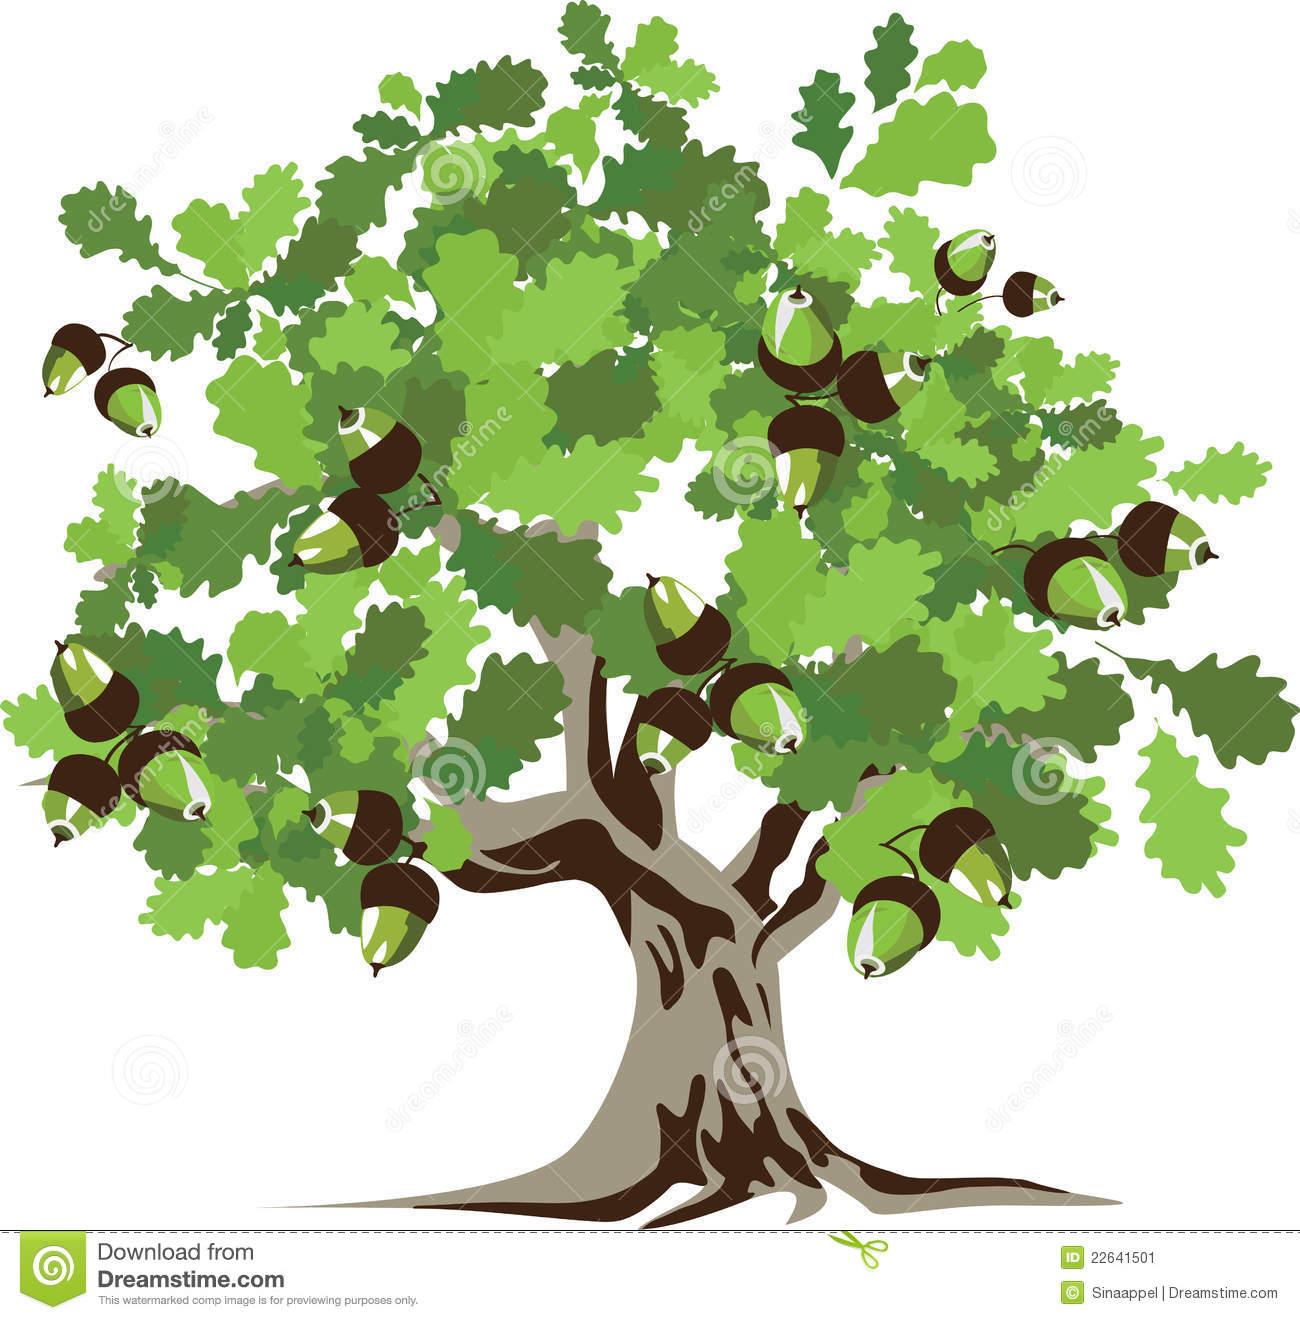 Oak tree with acorns clipart.